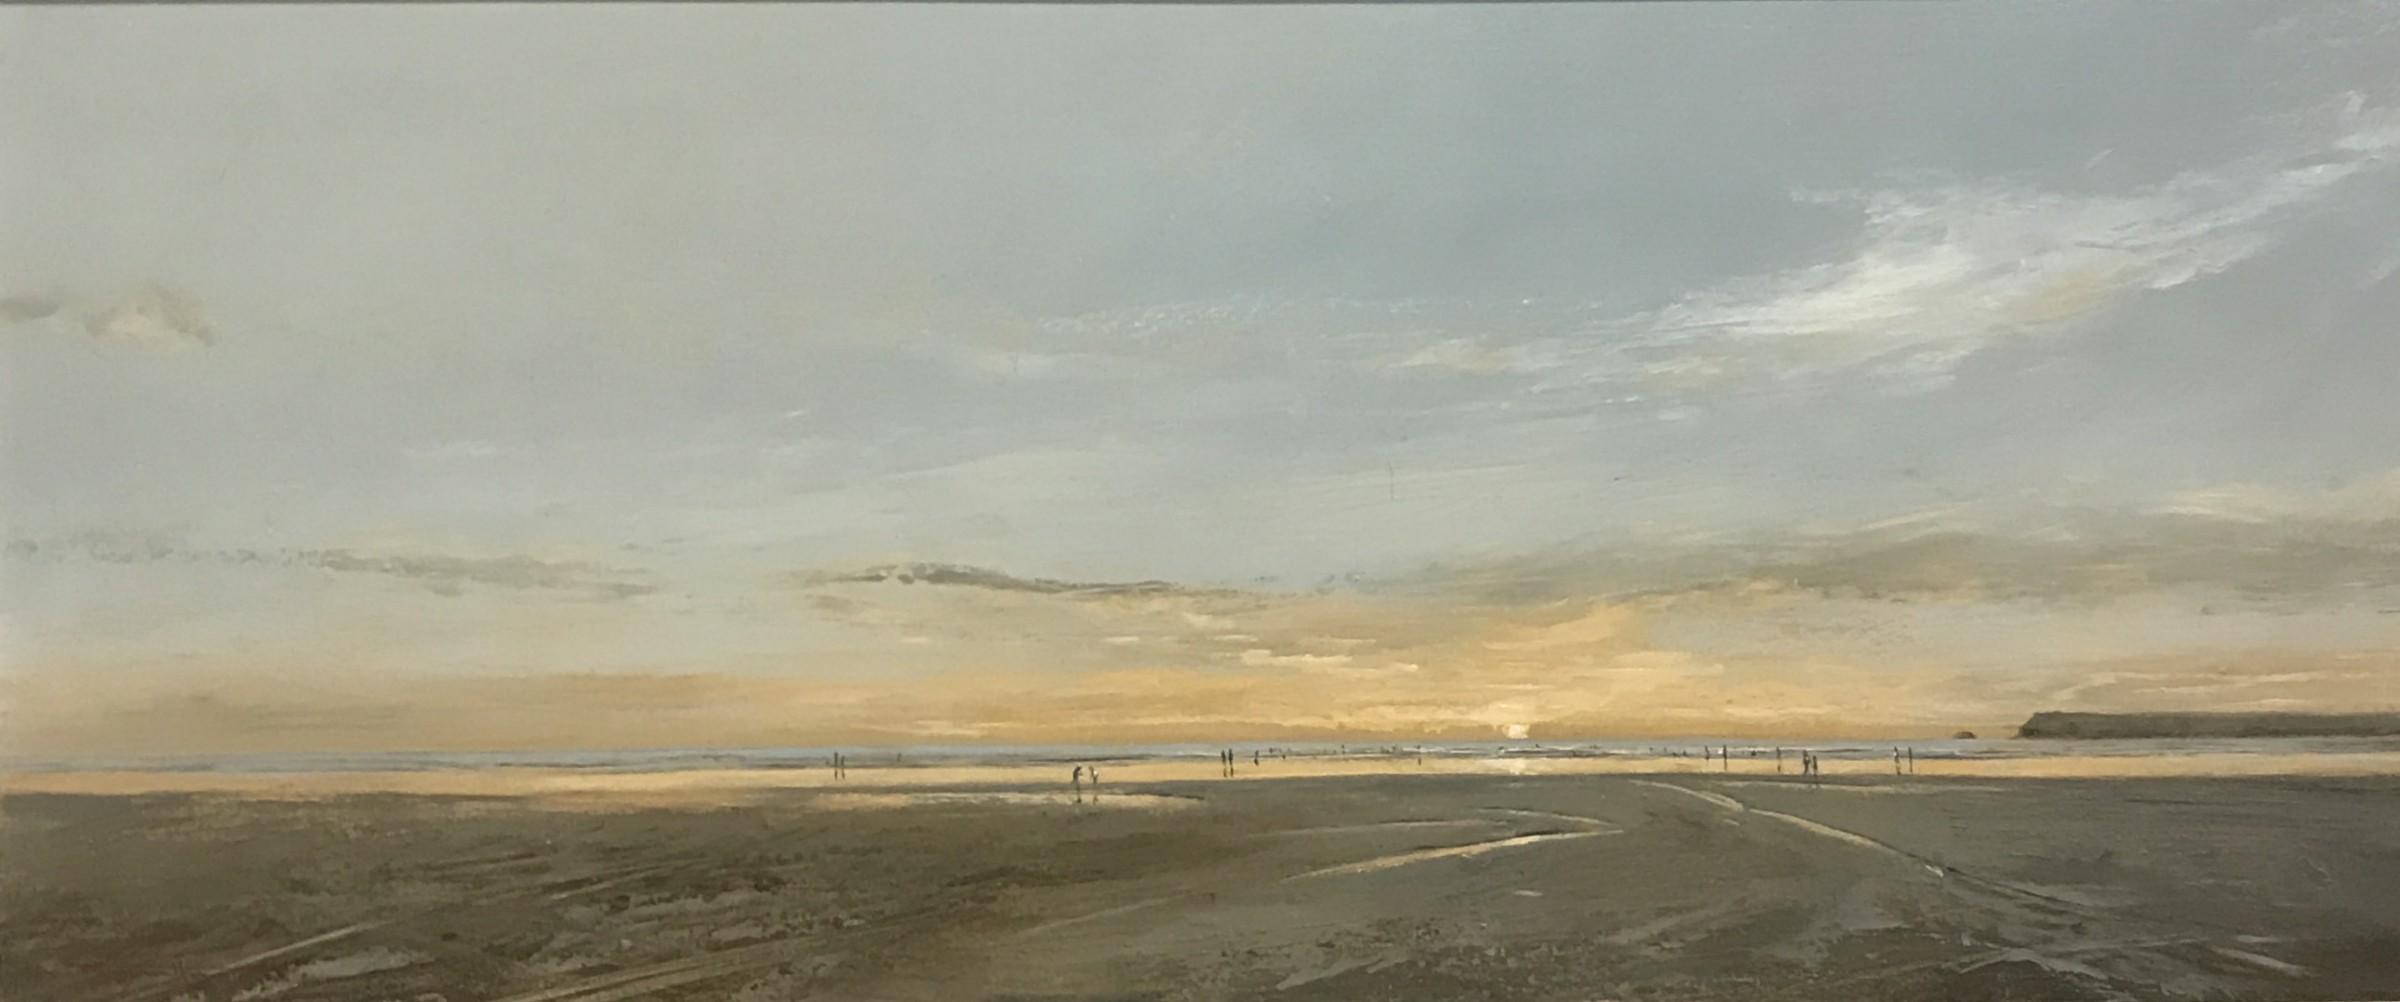 <span class=&#34;link fancybox-details-link&#34;><a href=&#34;/artists/44-bryan-hanlon/works/242-bryan-hanlon-sunset/&#34;>View Detail Page</a></span><div class=&#34;artist&#34;><strong>Bryan Hanlon</strong></div> <div class=&#34;title&#34;><em>Sunset</em></div> <div class=&#34;medium&#34;>Oil on Board</div> <div class=&#34;dimensions&#34;>30 x 70 cm</div>